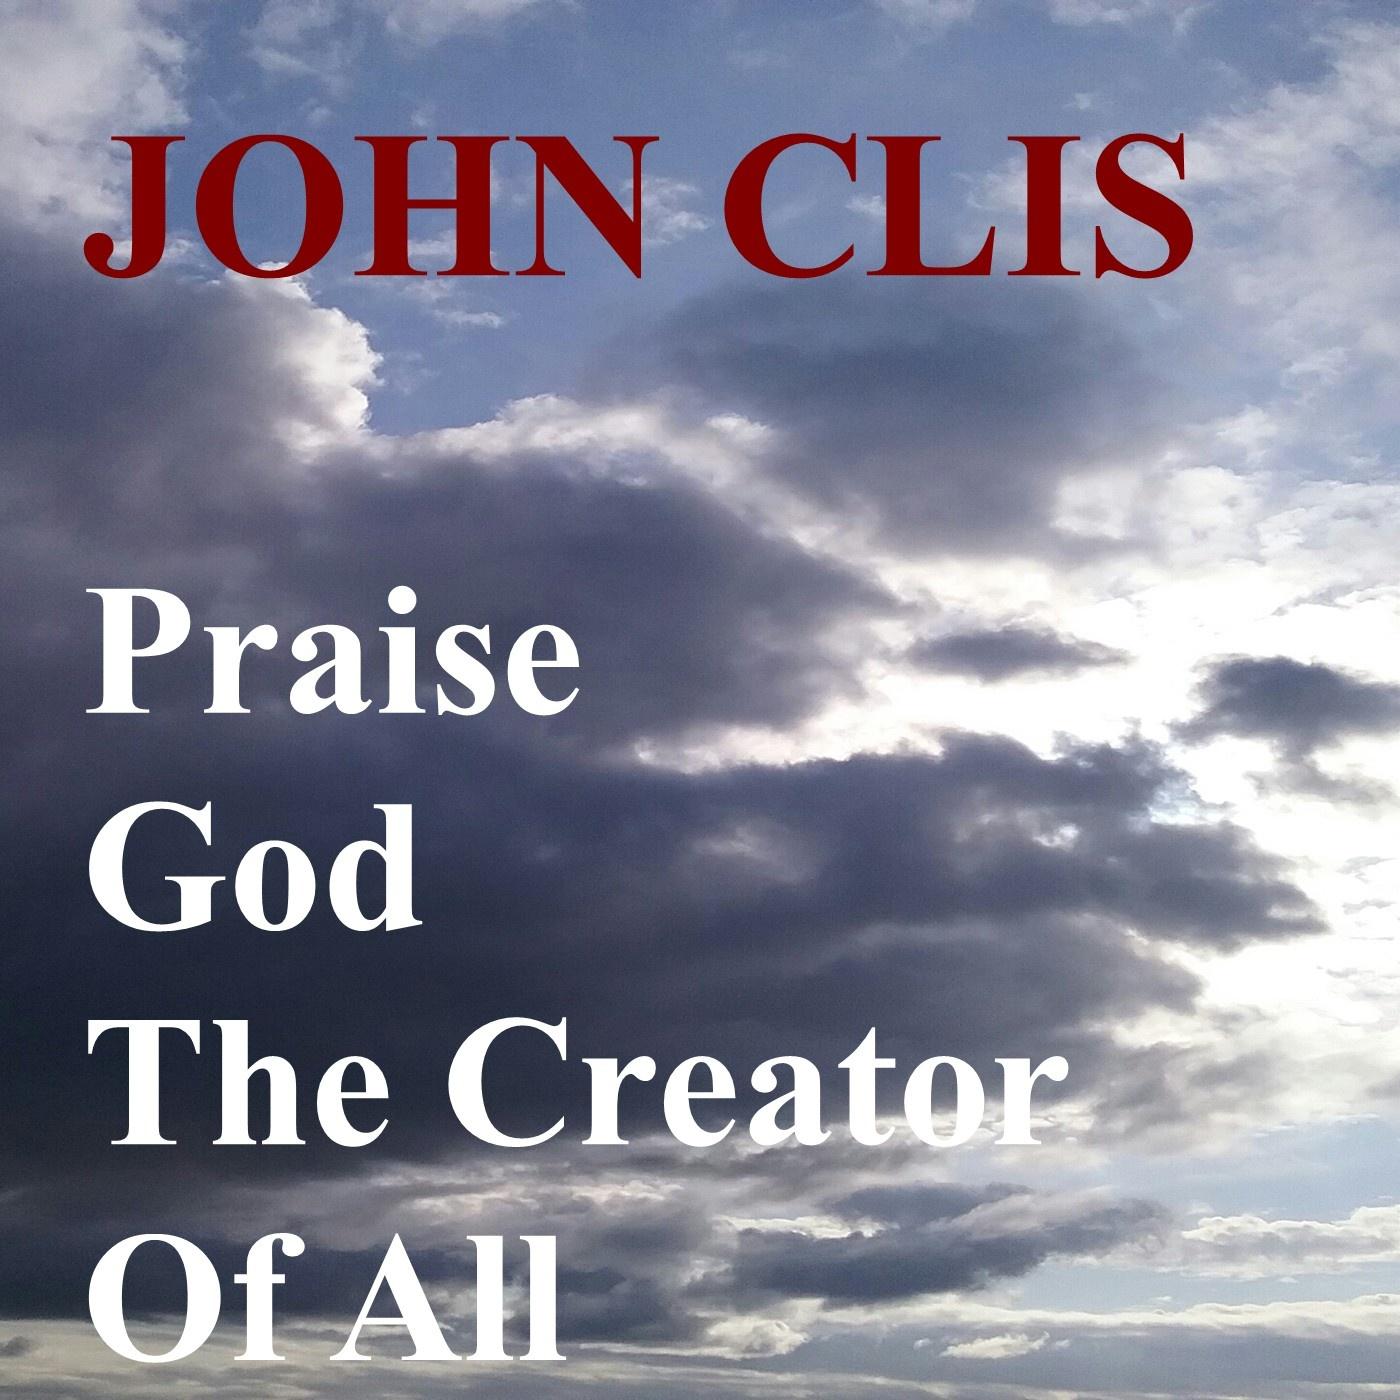 https://0201.nccdn.net/1_2/000/000/0eb/293/John-Clis---Praise-God-The-Creator-Of-All---Picture-1-1400x1400.jpg